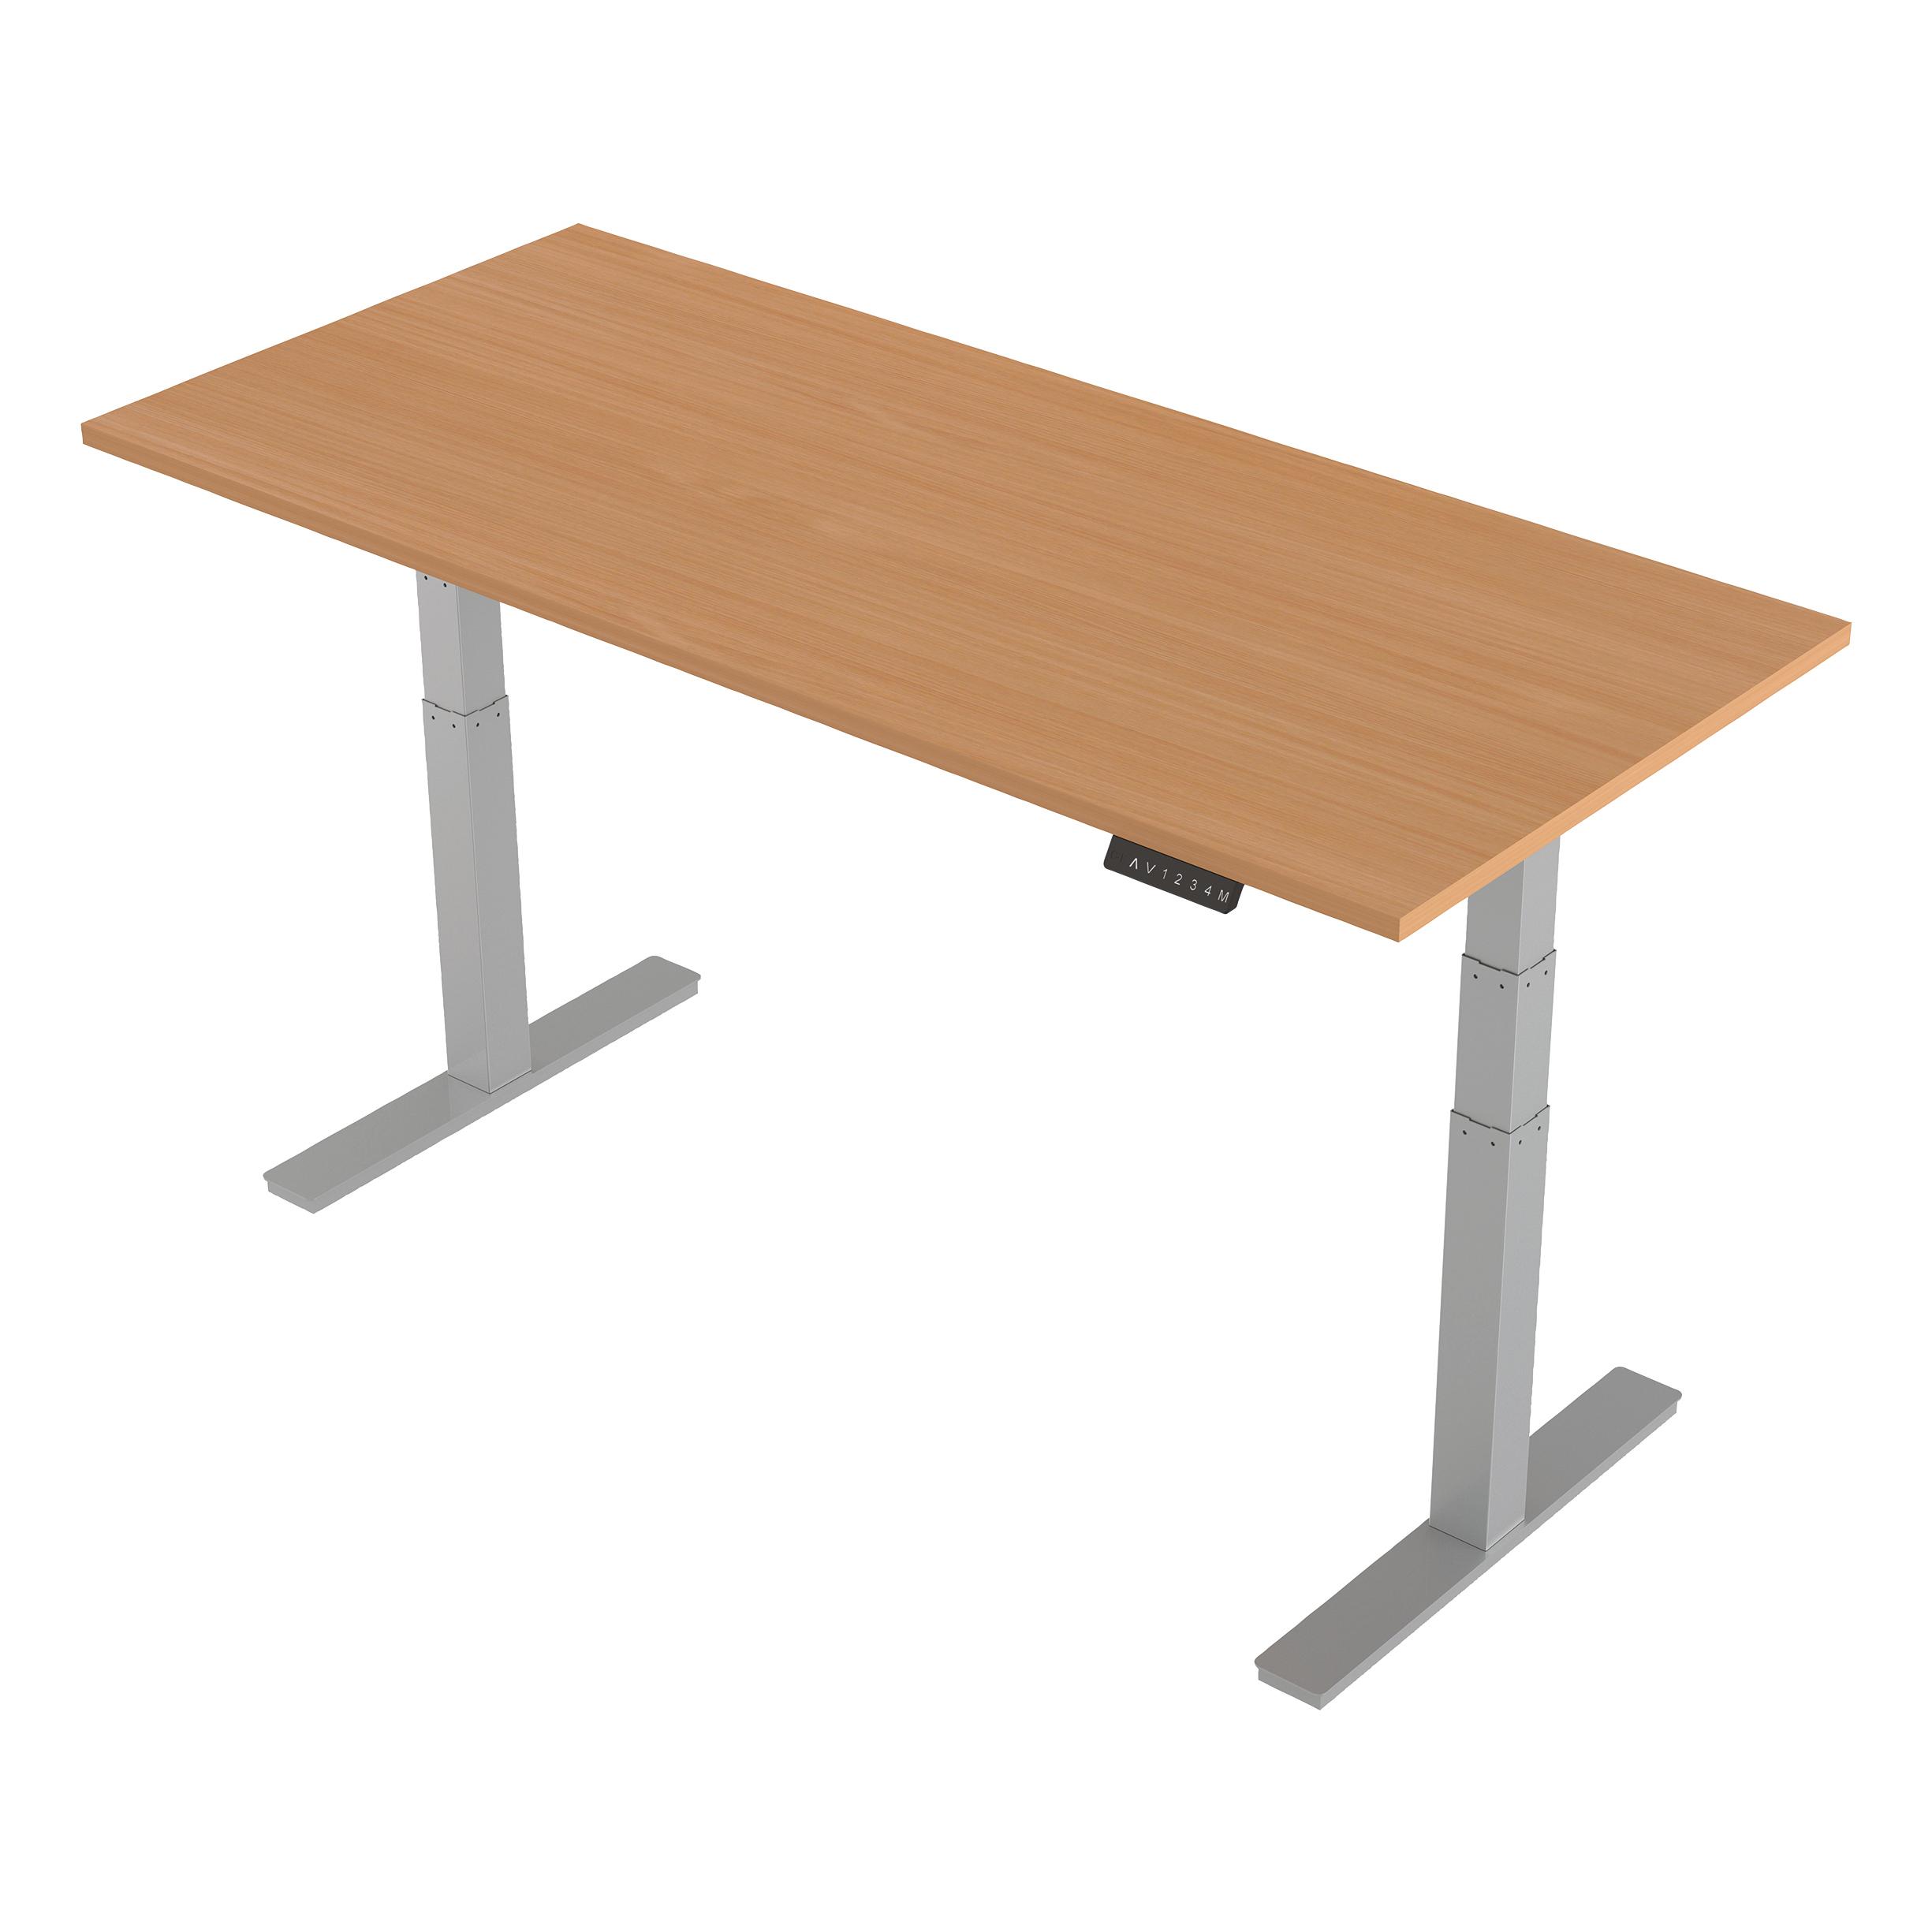 Trexus Sit-Stand Desk Height-adjustable Silver Leg Frame 1800/800mm Beech Ref HA01004